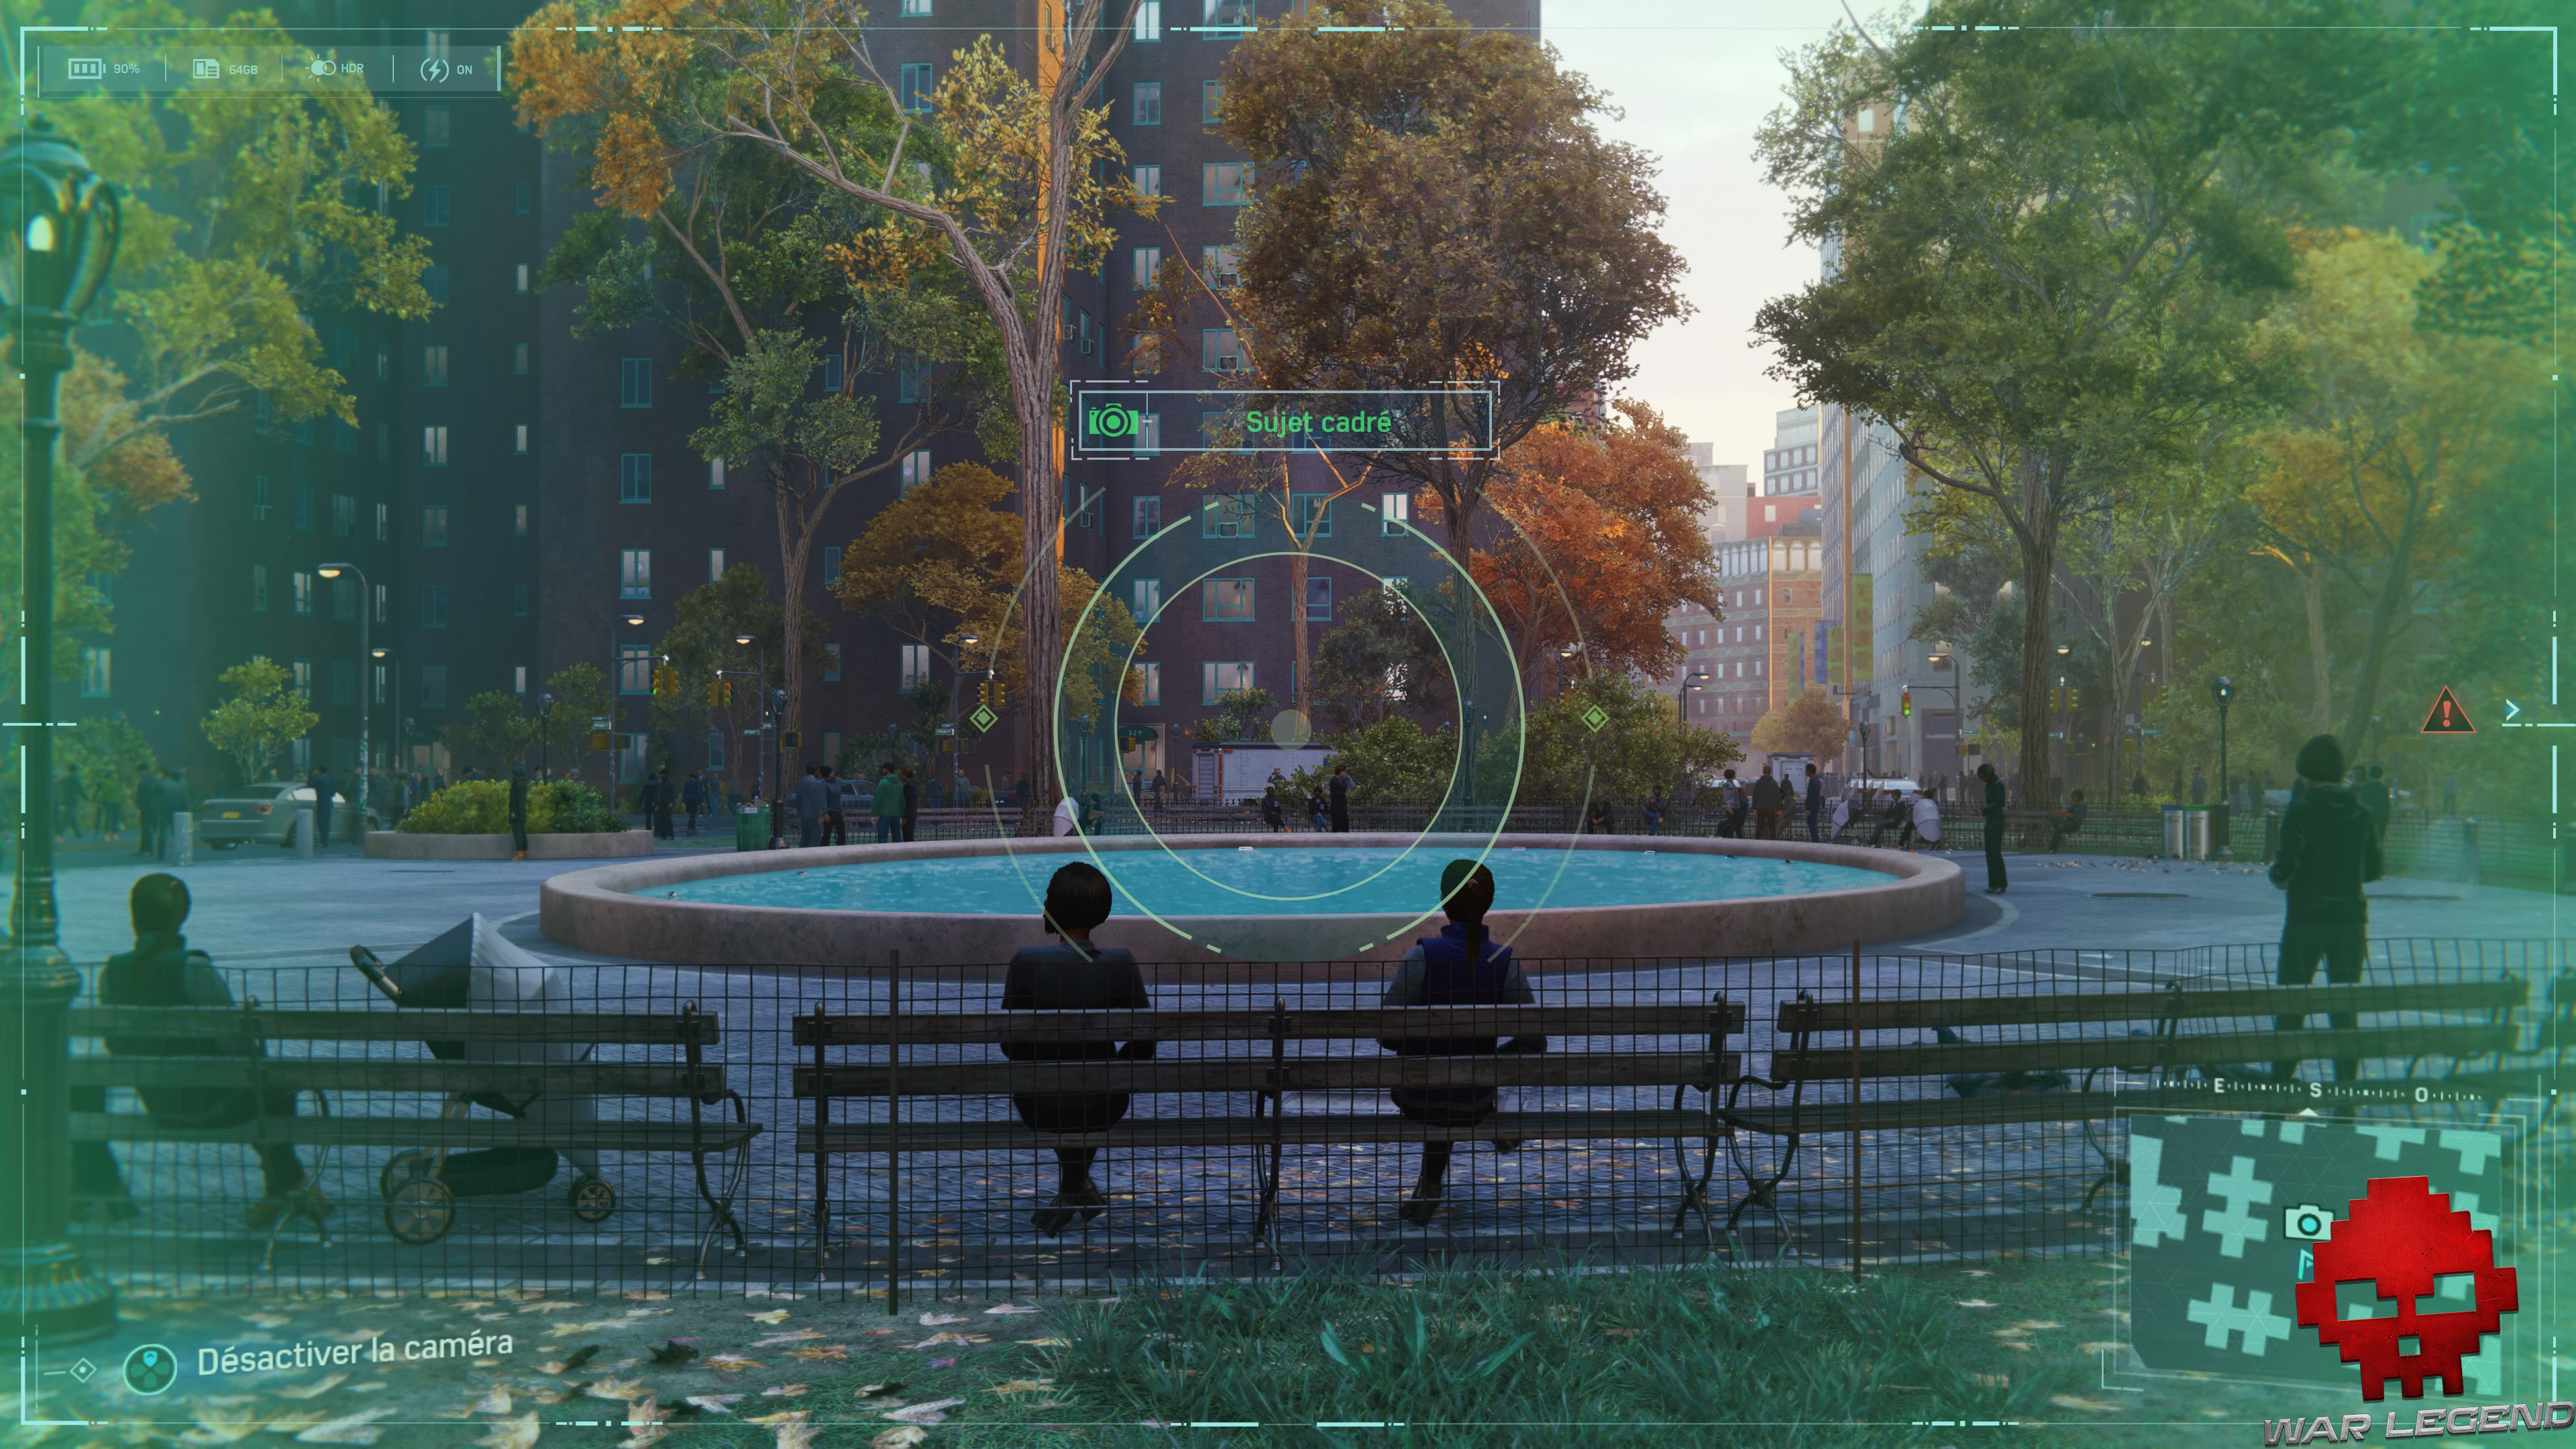 Spider-Man photo secrète Stuyvesant town Fountain